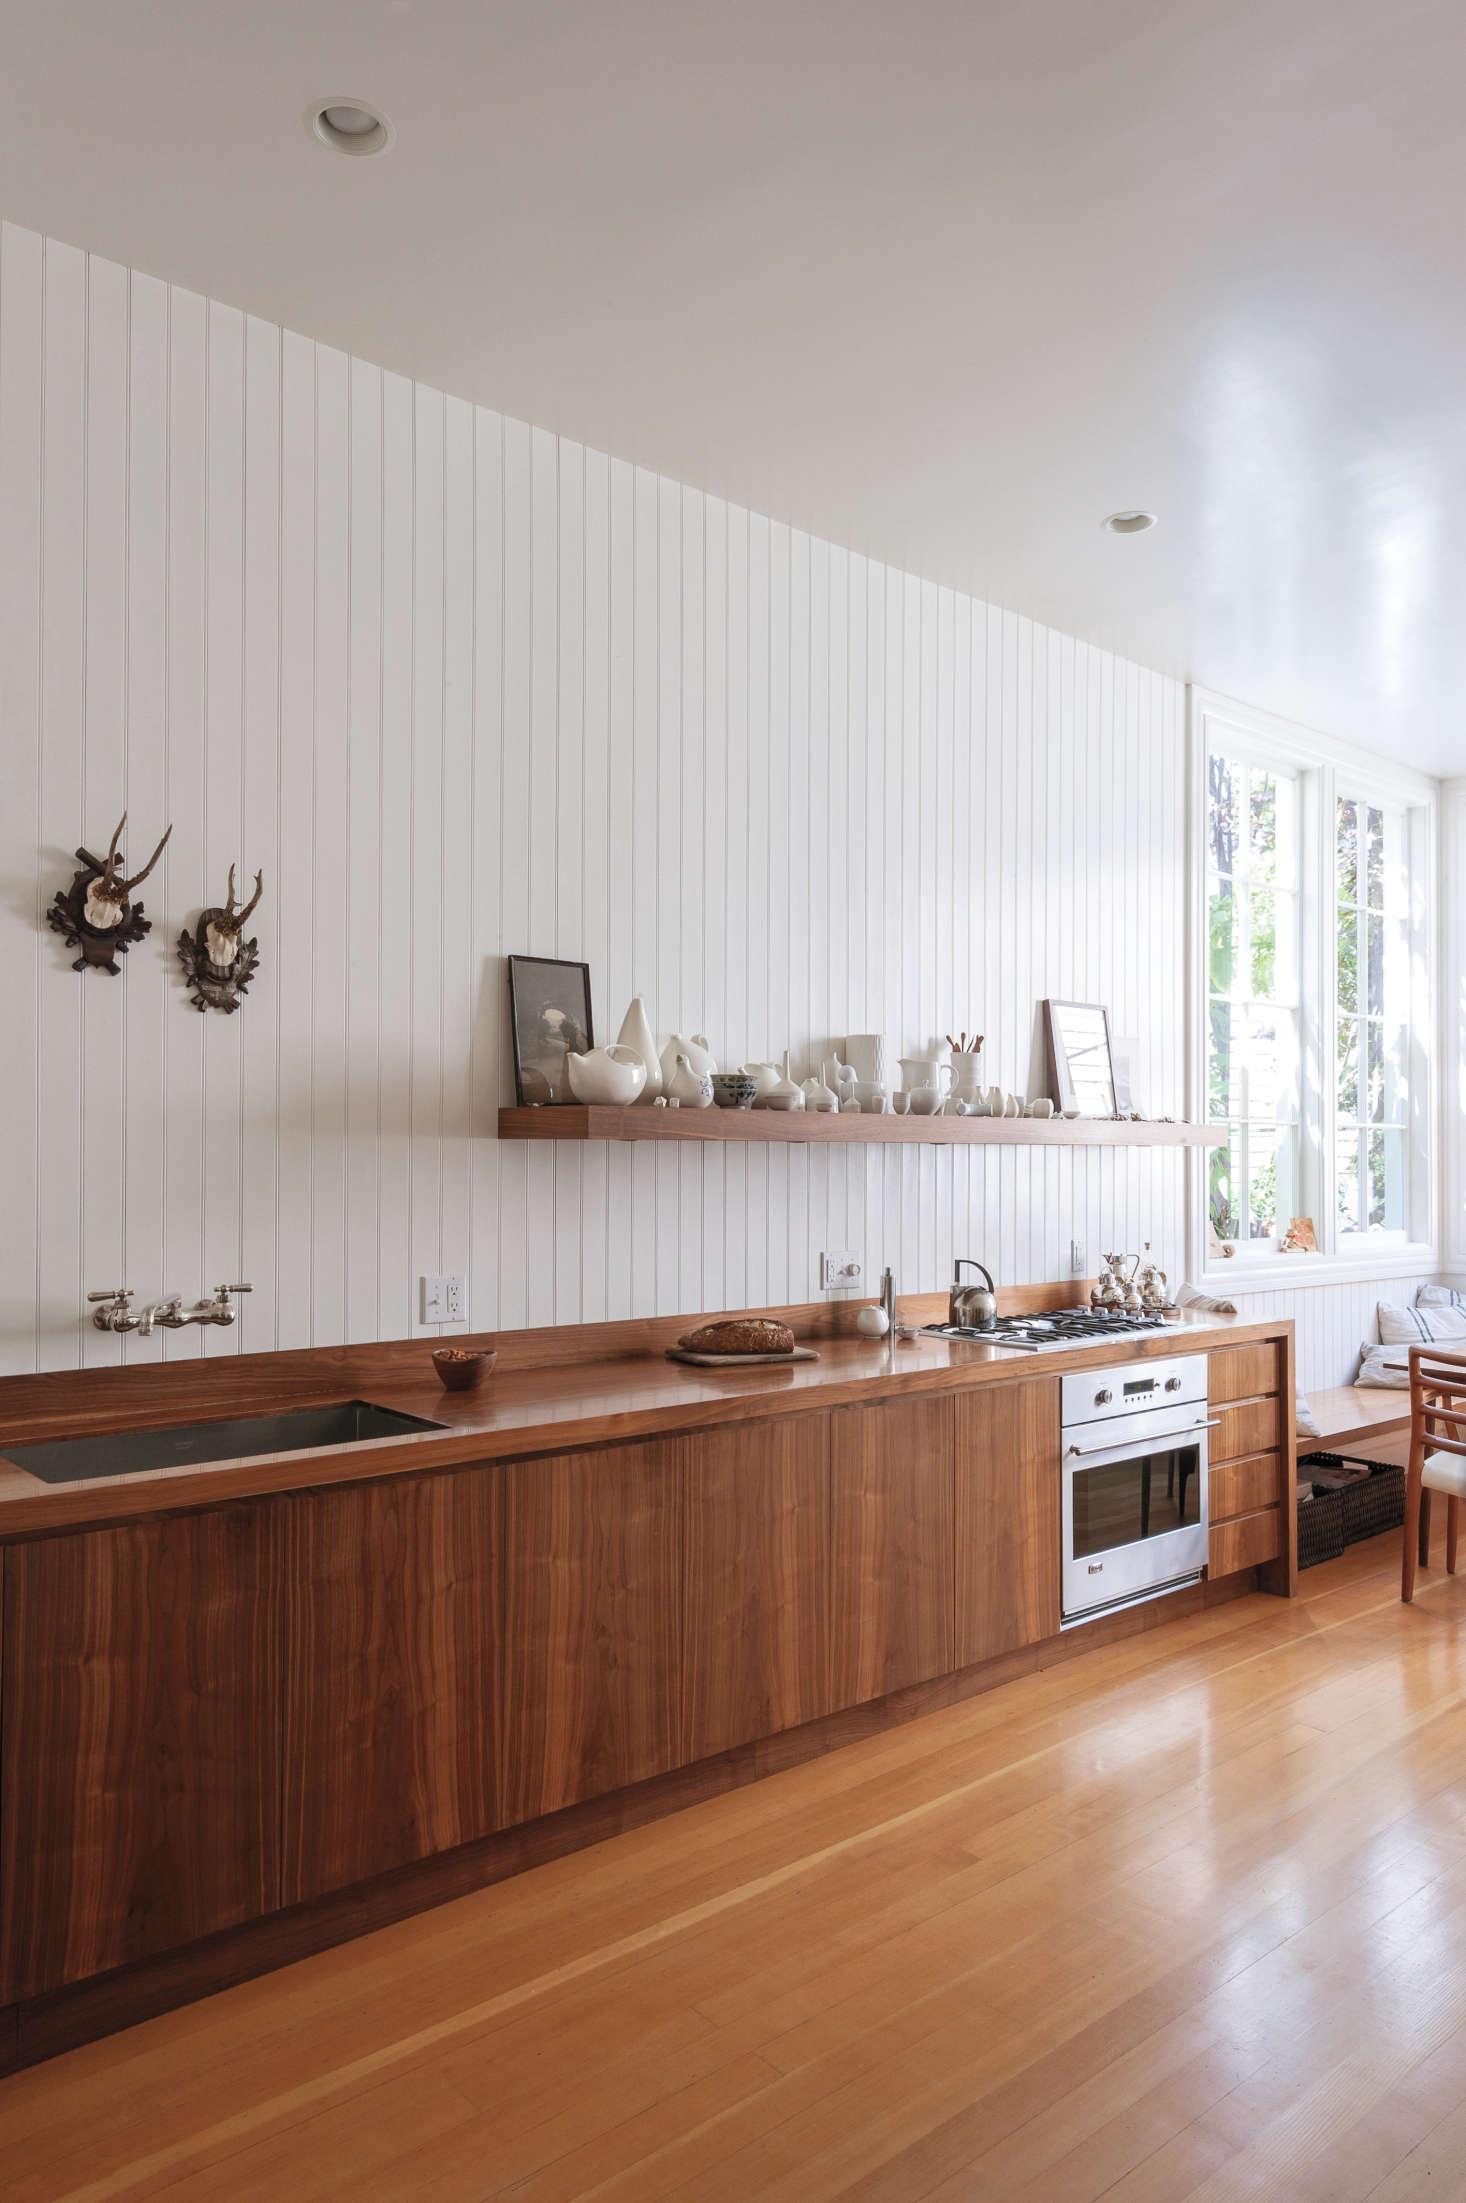 Dagmar Daley Kitchen for Remodelista Book